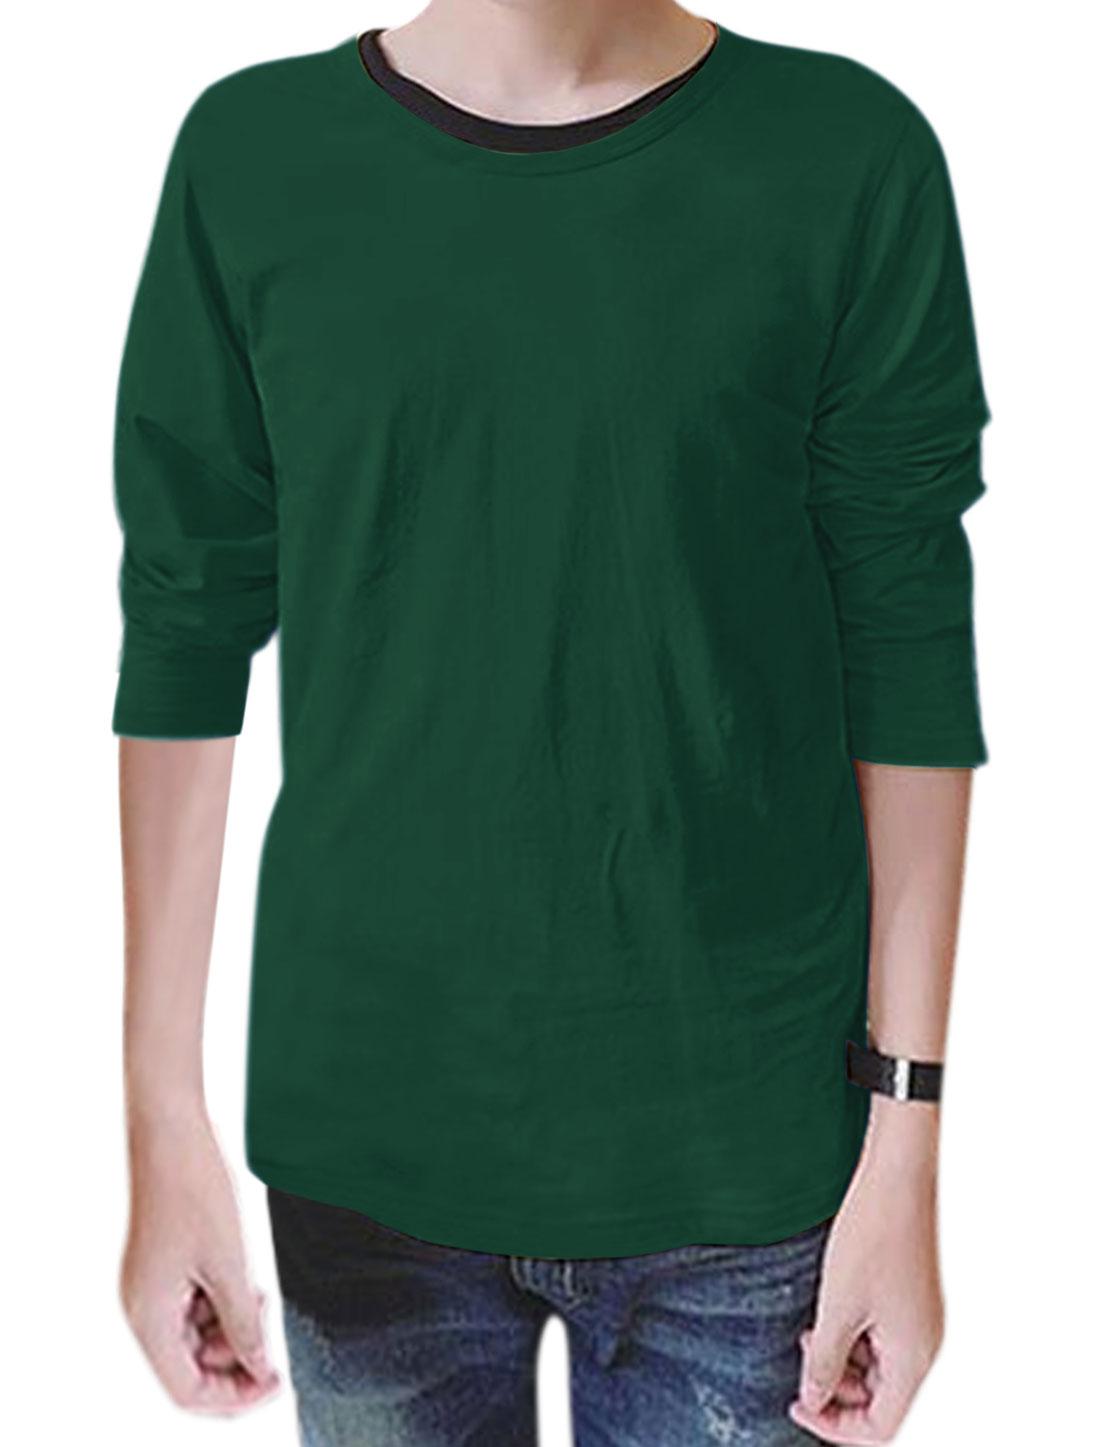 Men Round Neck Long Sleeves Slim Fit Tee Shirt Green M